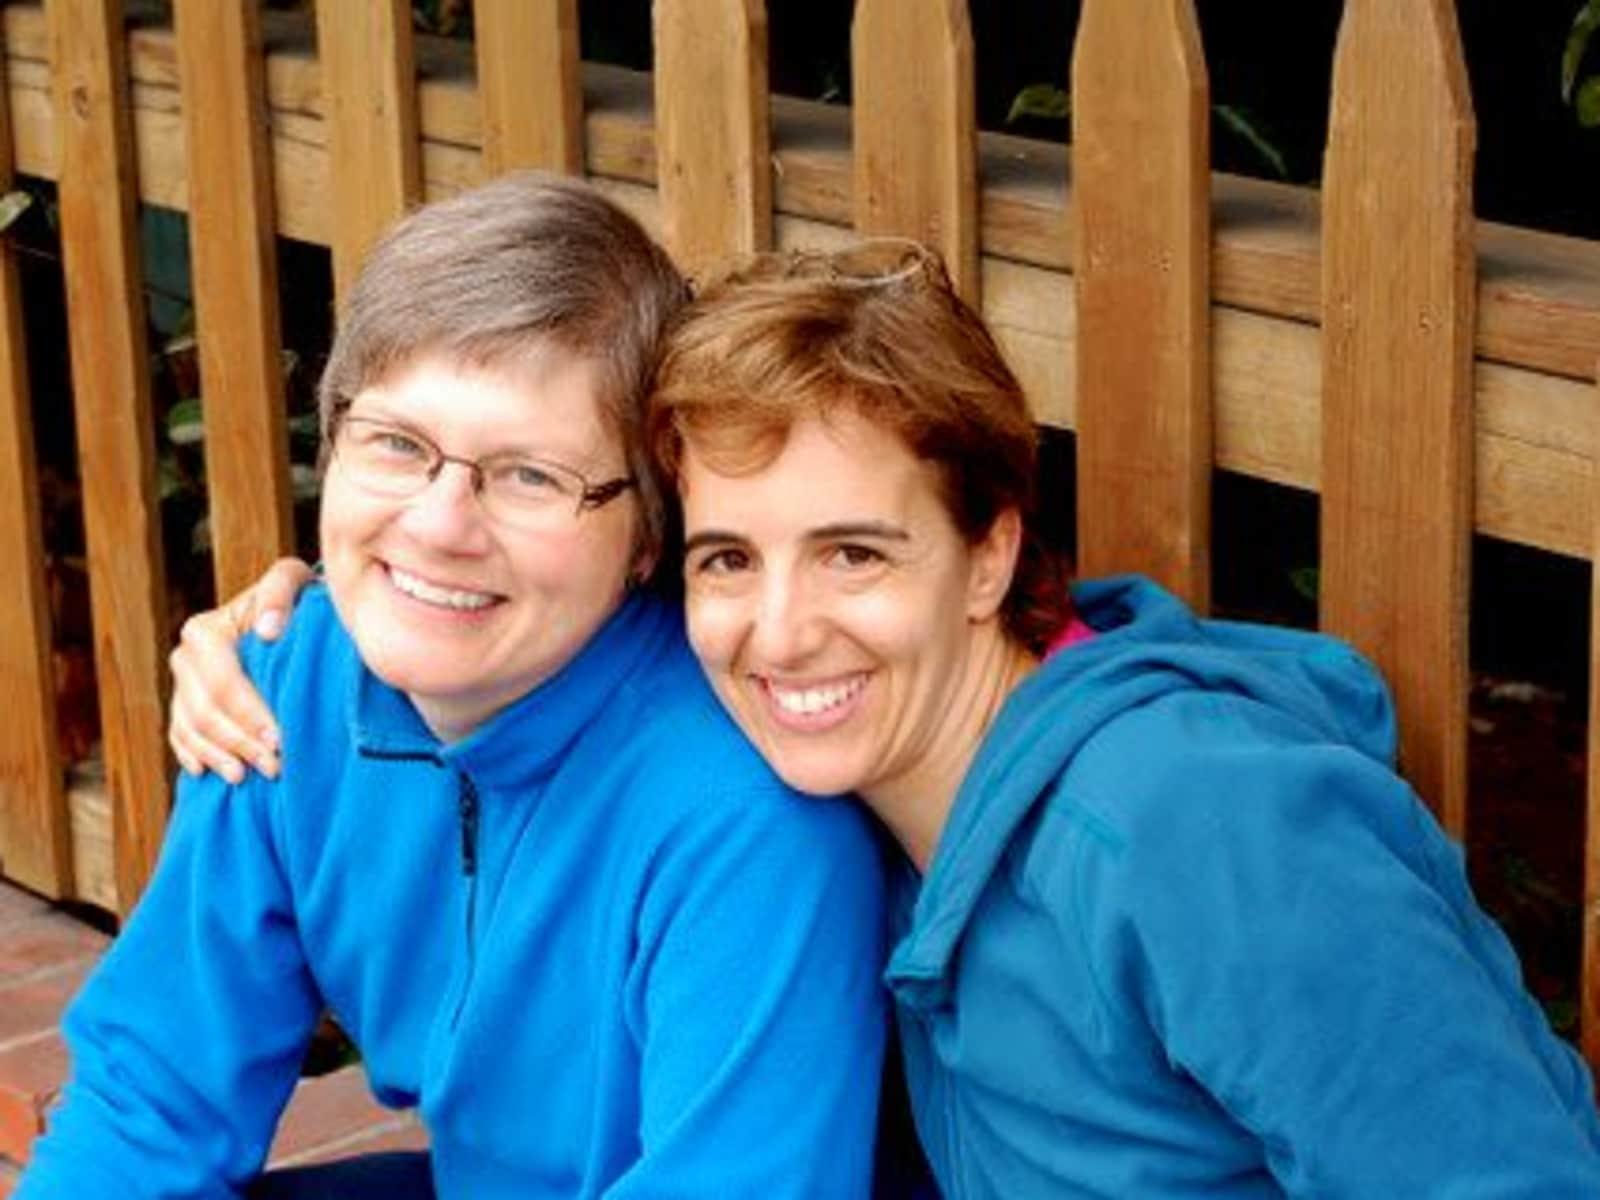 Lisl & Cate from Santa Rosa, California, United States